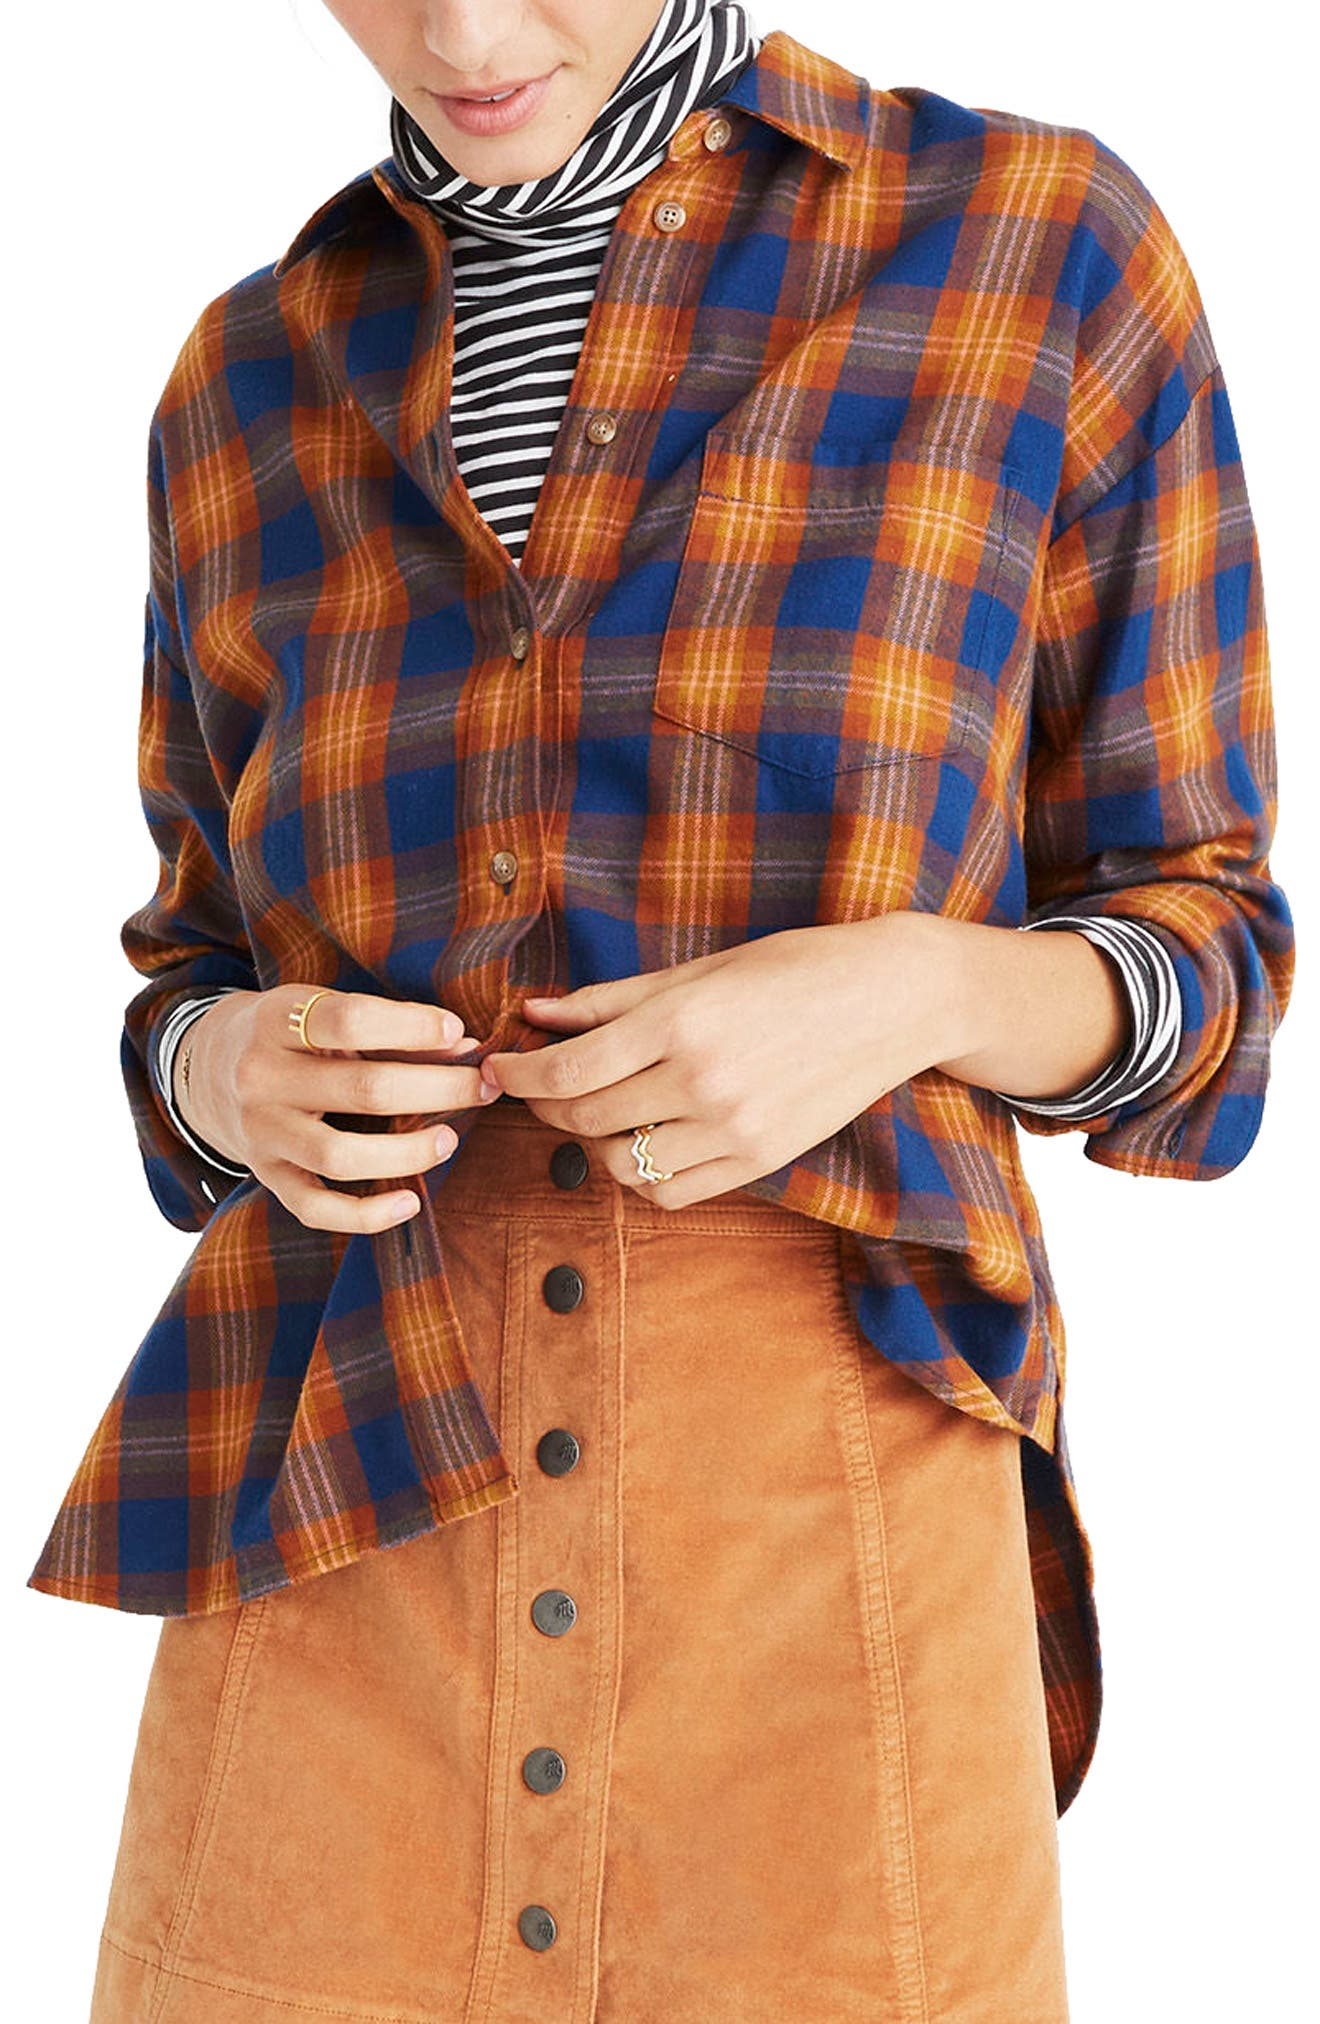 Westward Ardan Plaid Shirt,                         Main,                         color, Dark River